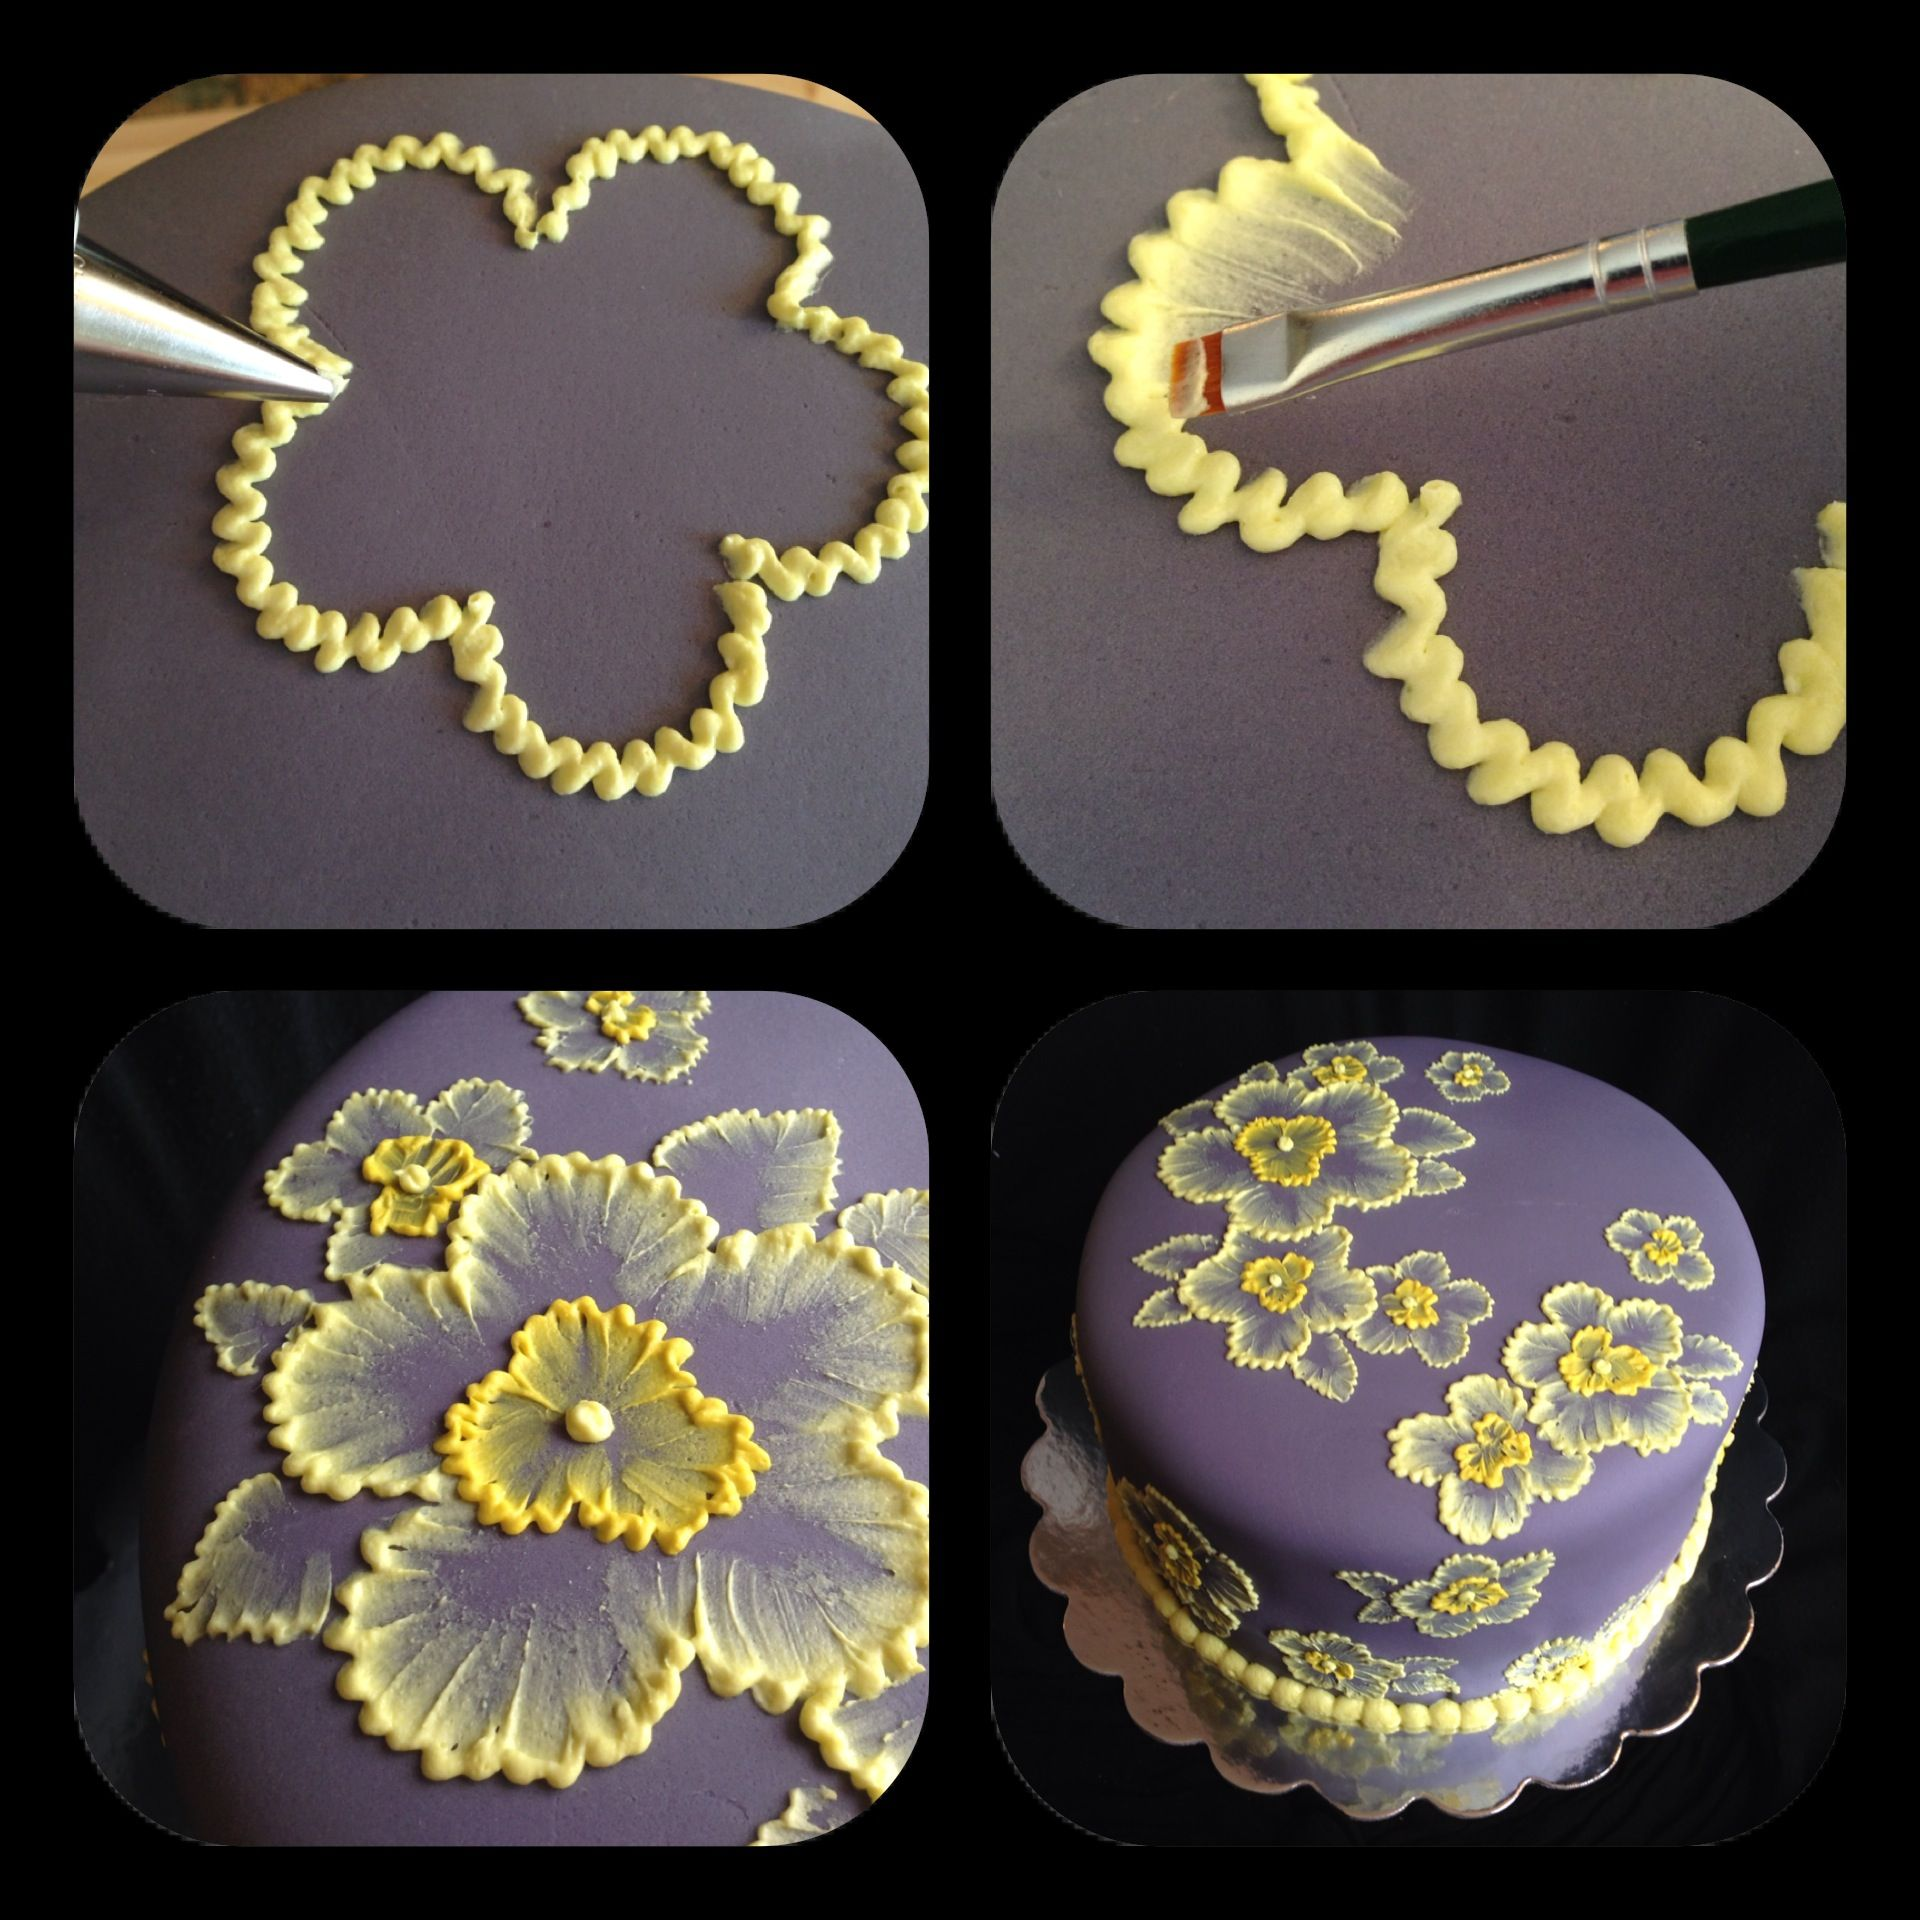 Best Cake Ever Contest Brush Embroidery Cake Cake